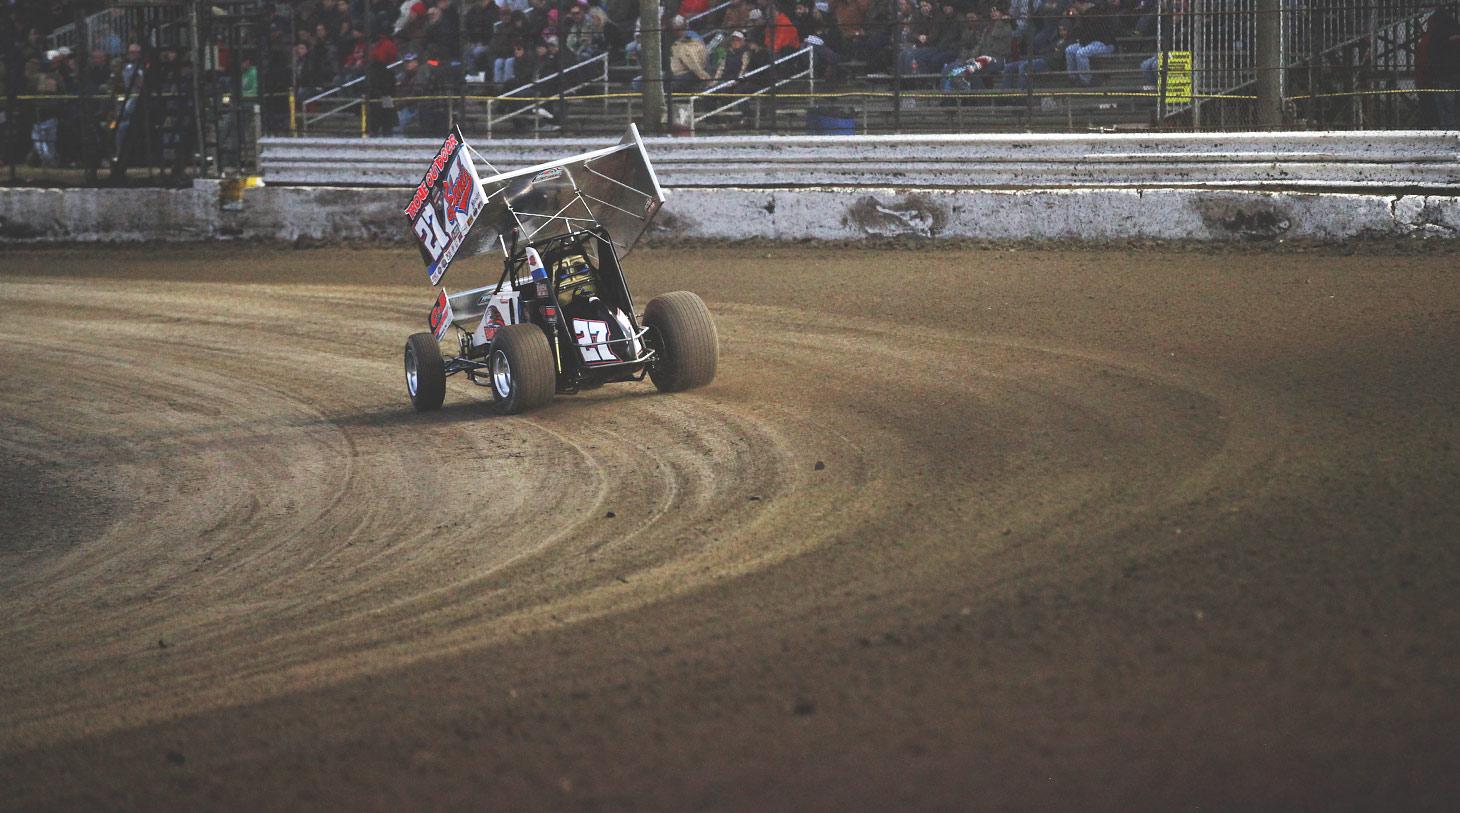 Hodnett blasts through turn 4 at Volusia | Photo: Jeffrey Turford